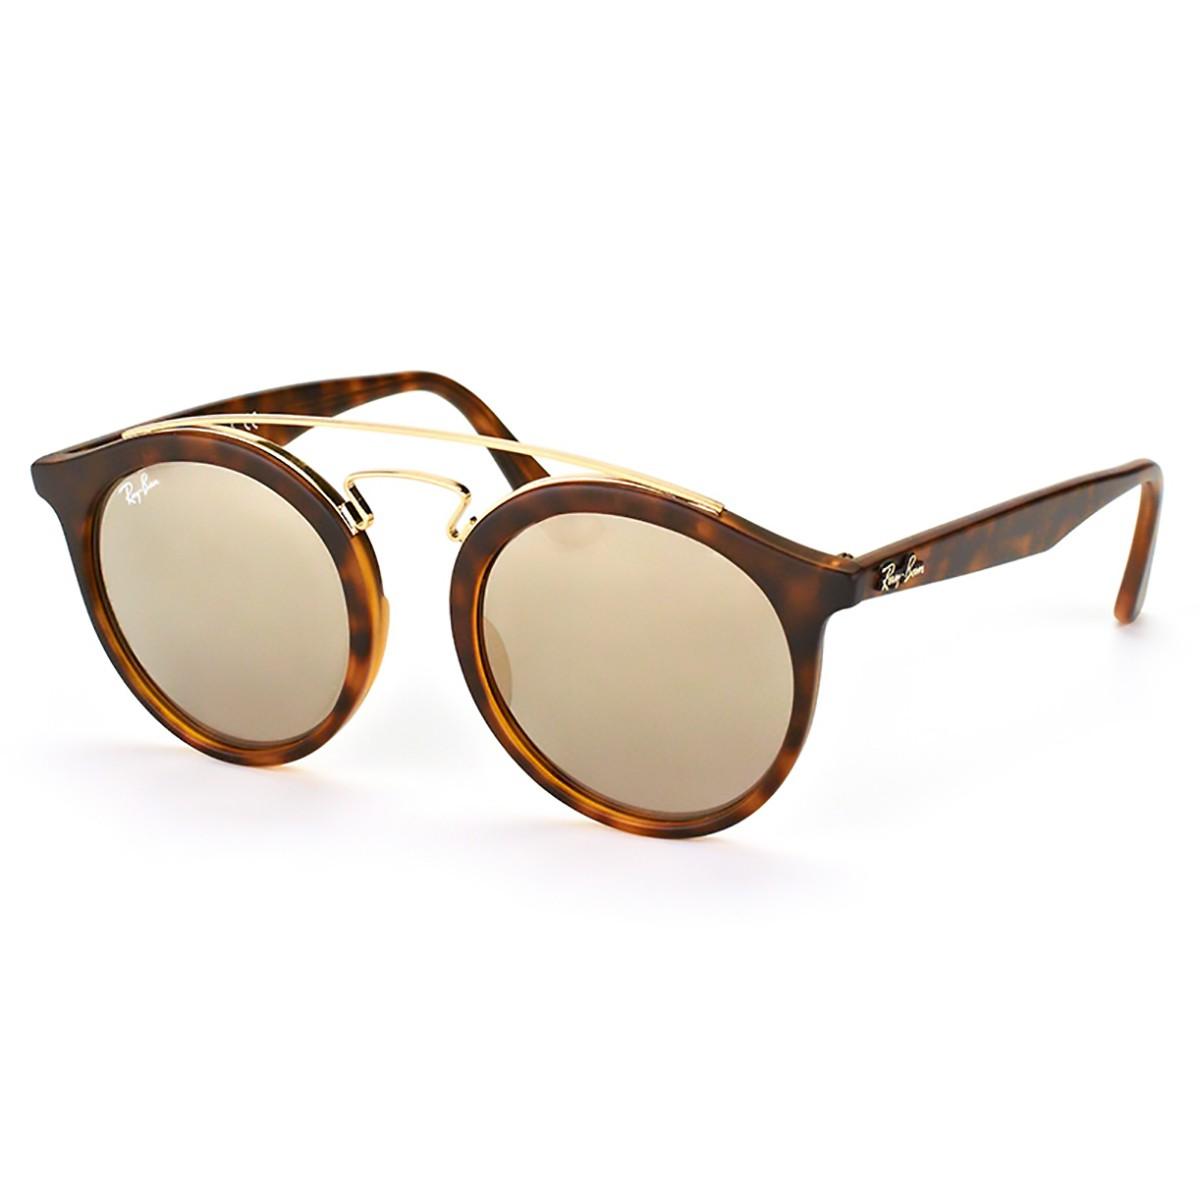 Compre Óculos de Sol Ray Ban Gatsby Redondo em 10X   Tri-Jóia Shop bf9bc17355